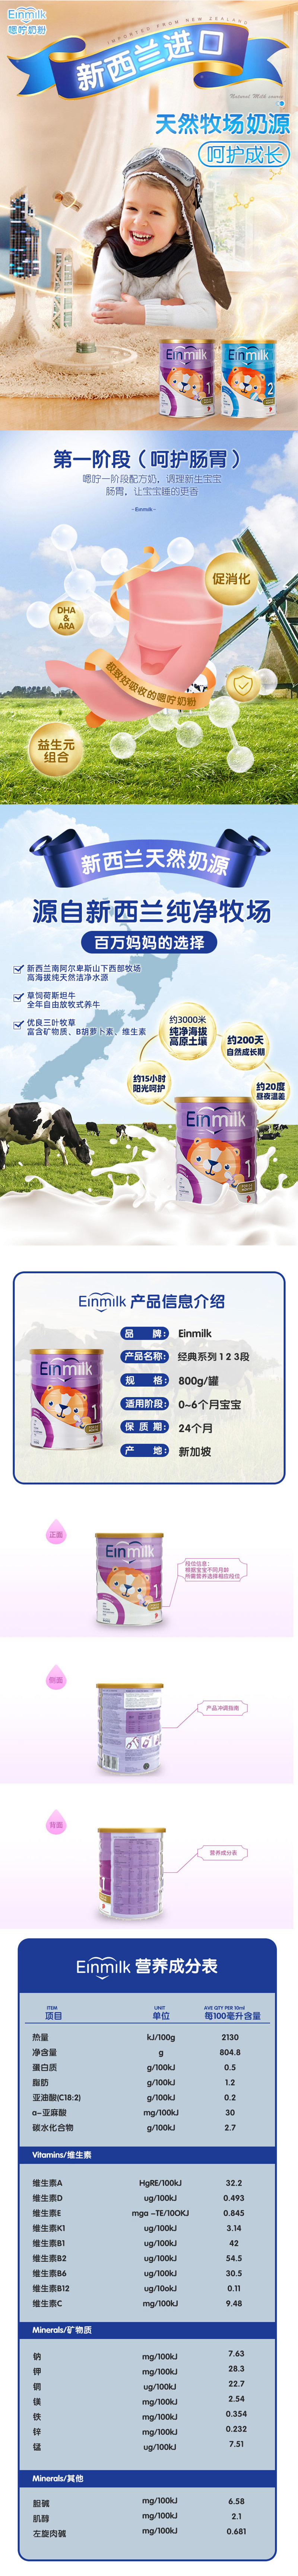 https://static.maiyah.com/images/ueFile/product/2020123009513876125996.jpg